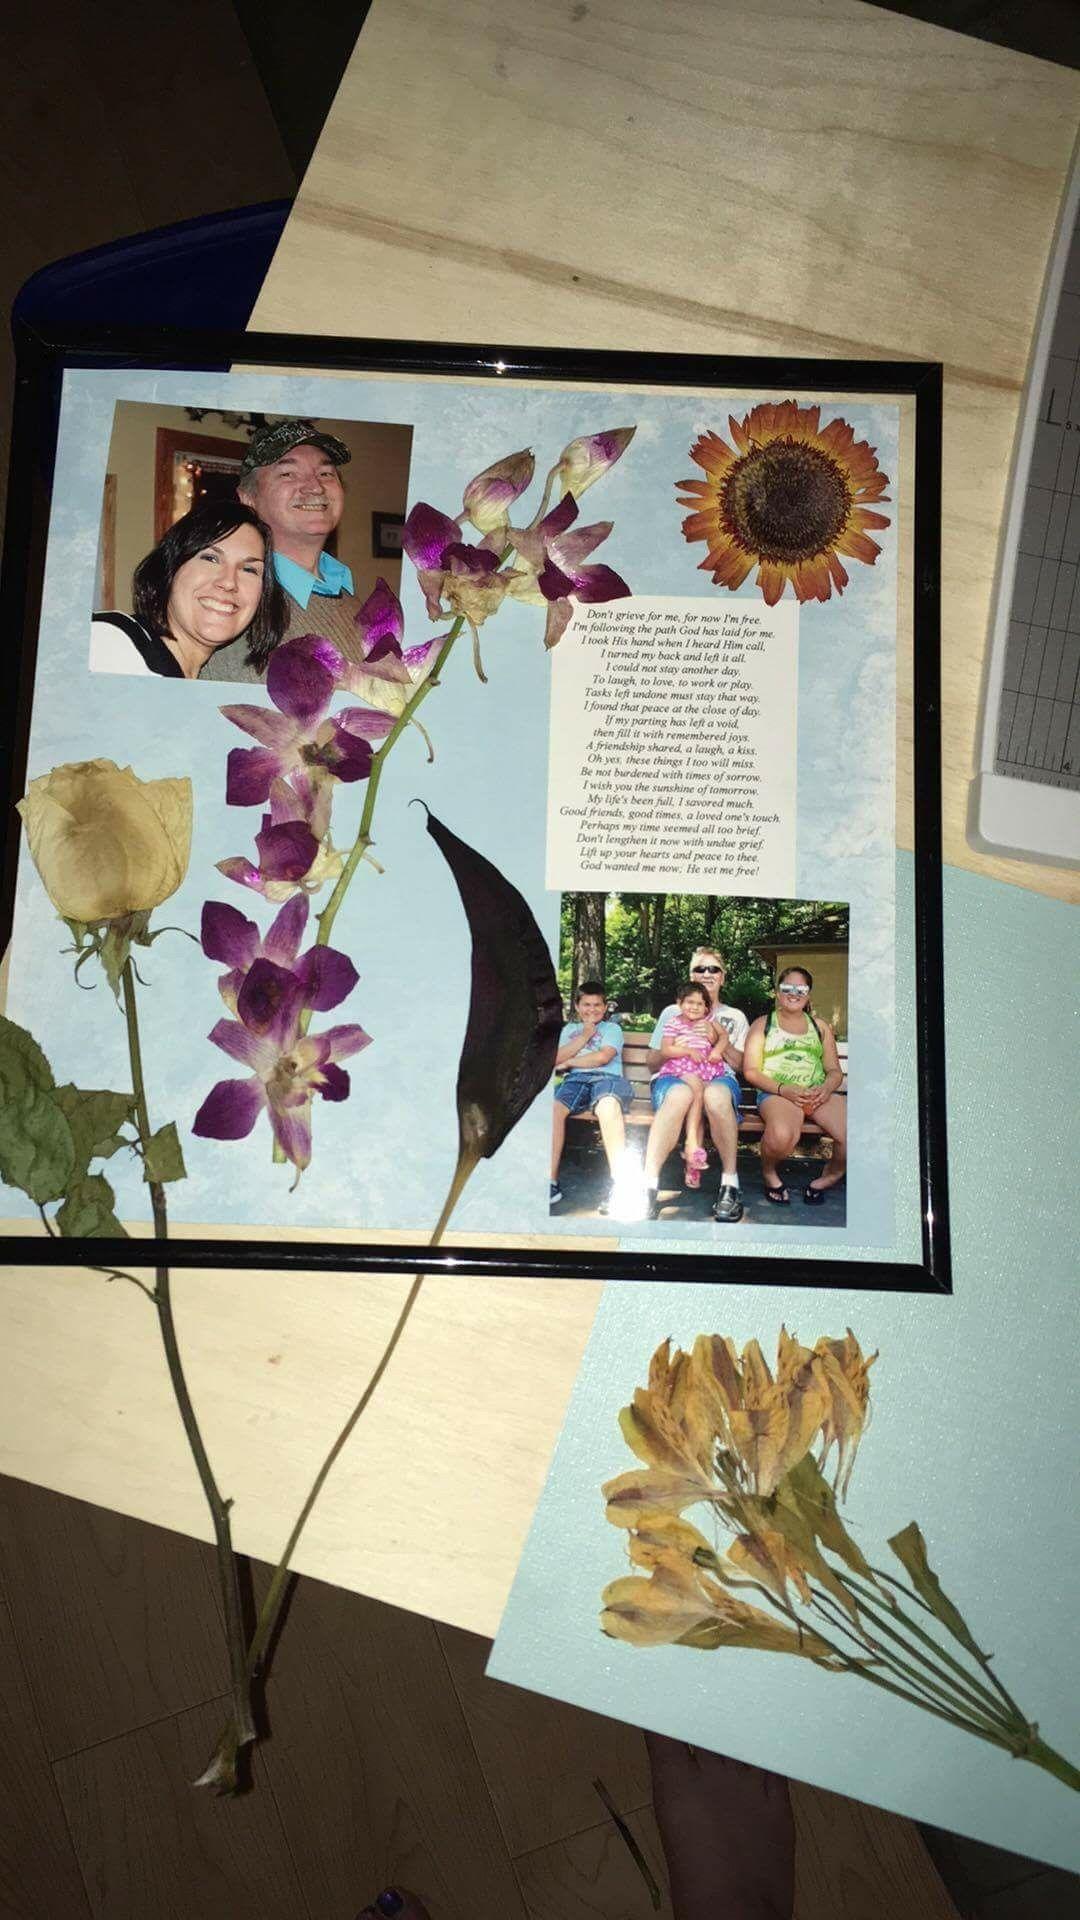 pinbambi brooks on memorial frames | pinterest